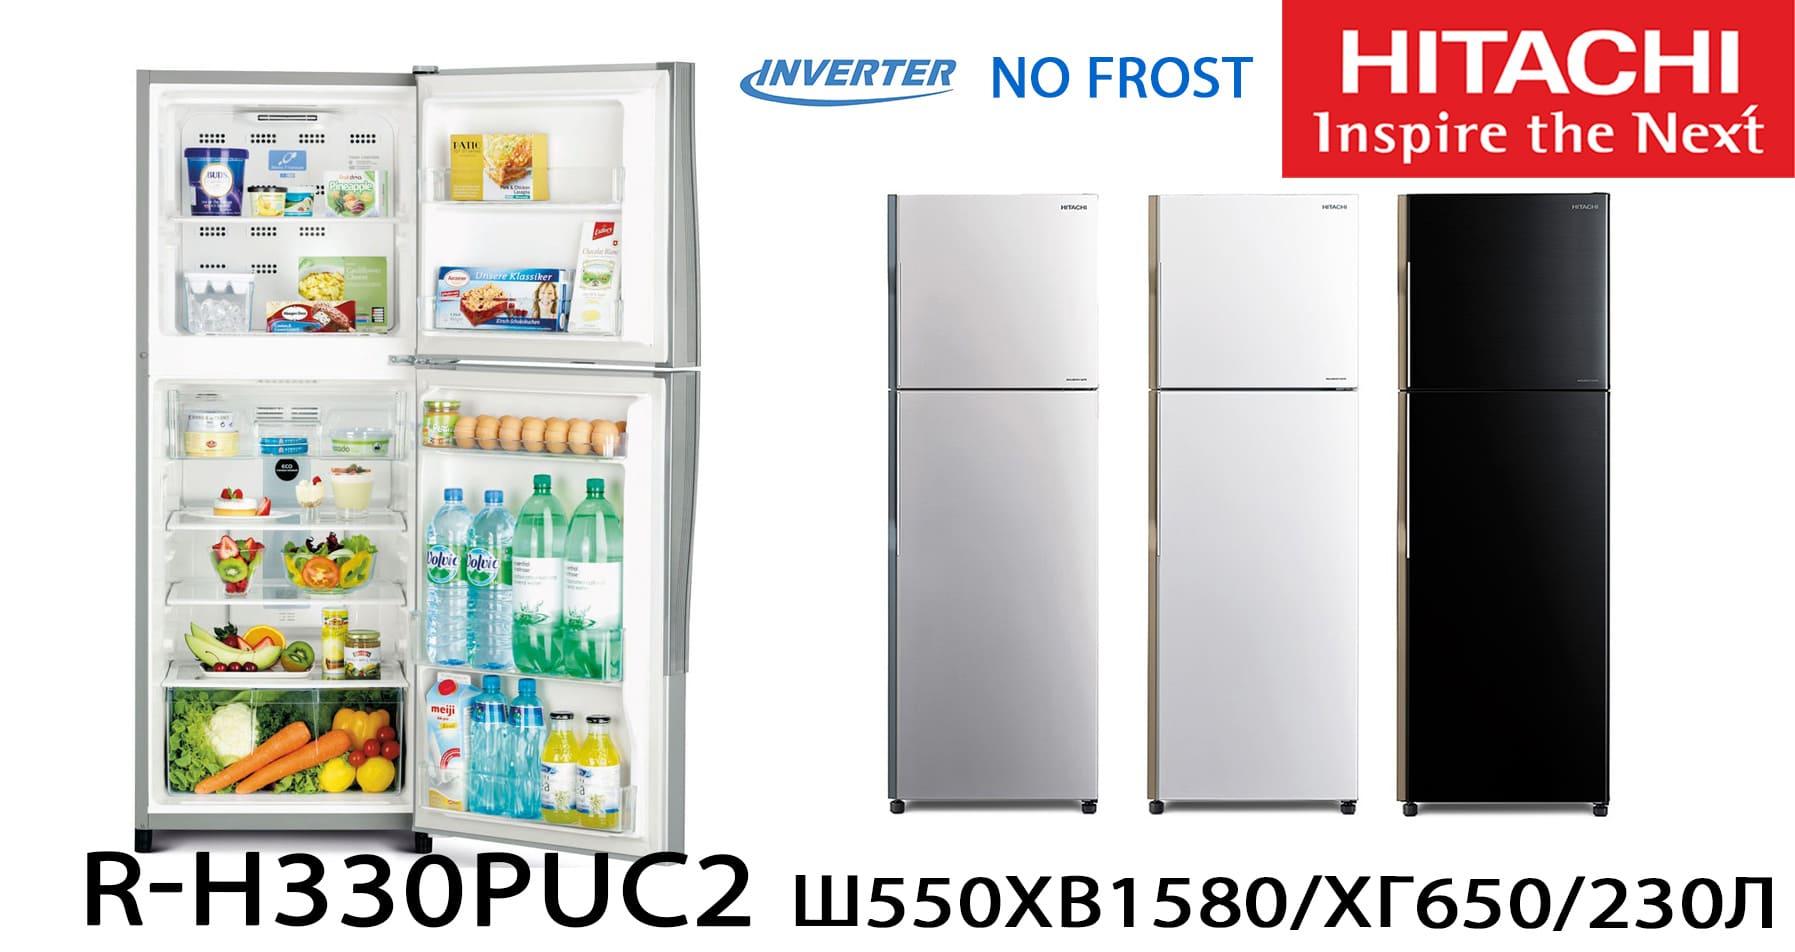 Hitachi_r-H330_vse_cveta Топ бюджетных холодильников